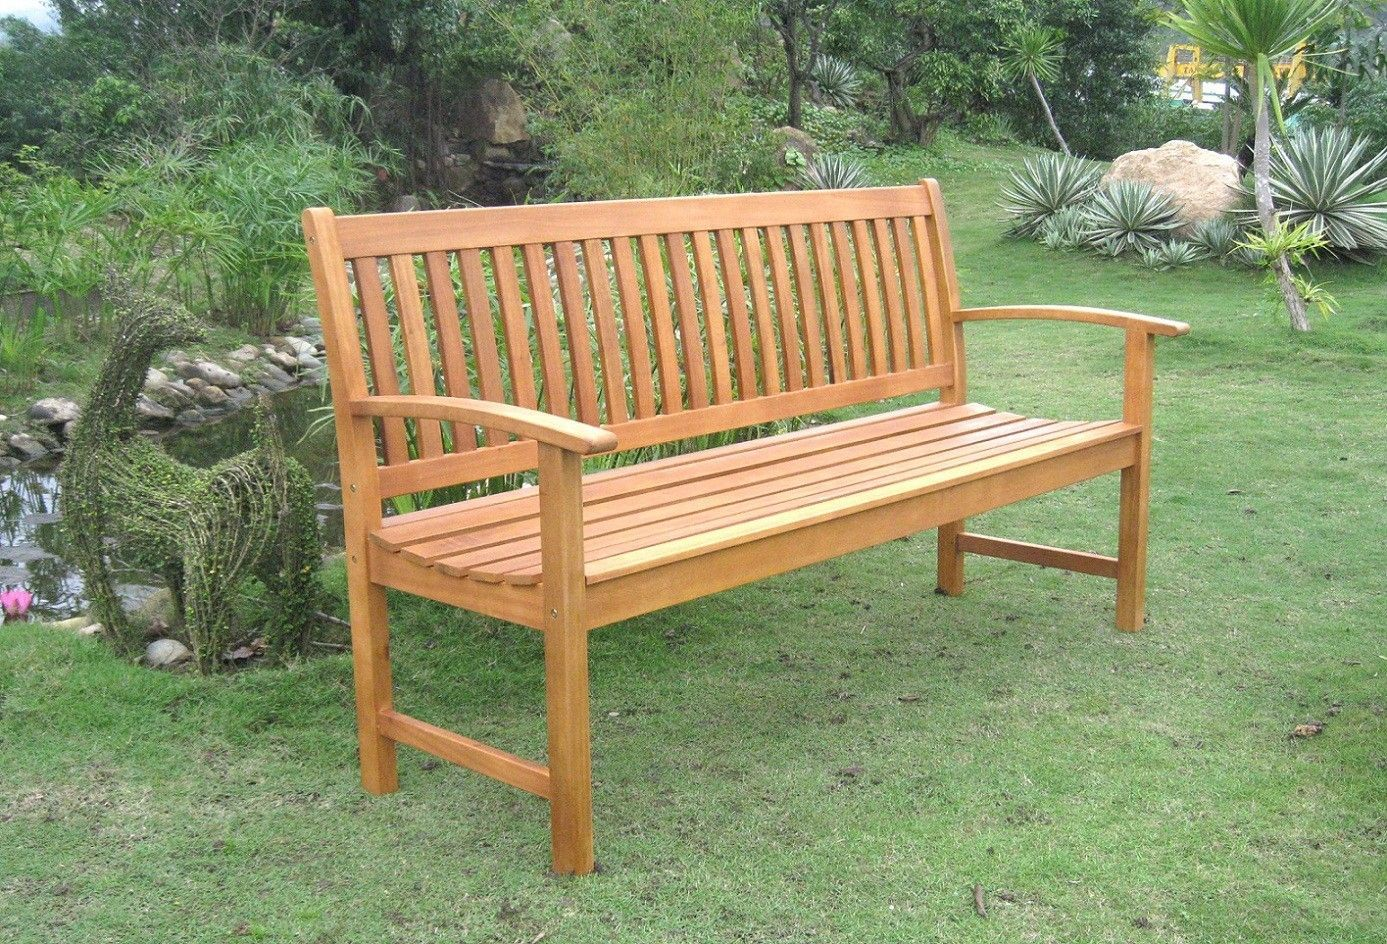 Terrific Royal Tahiti Balau 3 Seat Wood Garden Bench Outdoor Andrewgaddart Wooden Chair Designs For Living Room Andrewgaddartcom